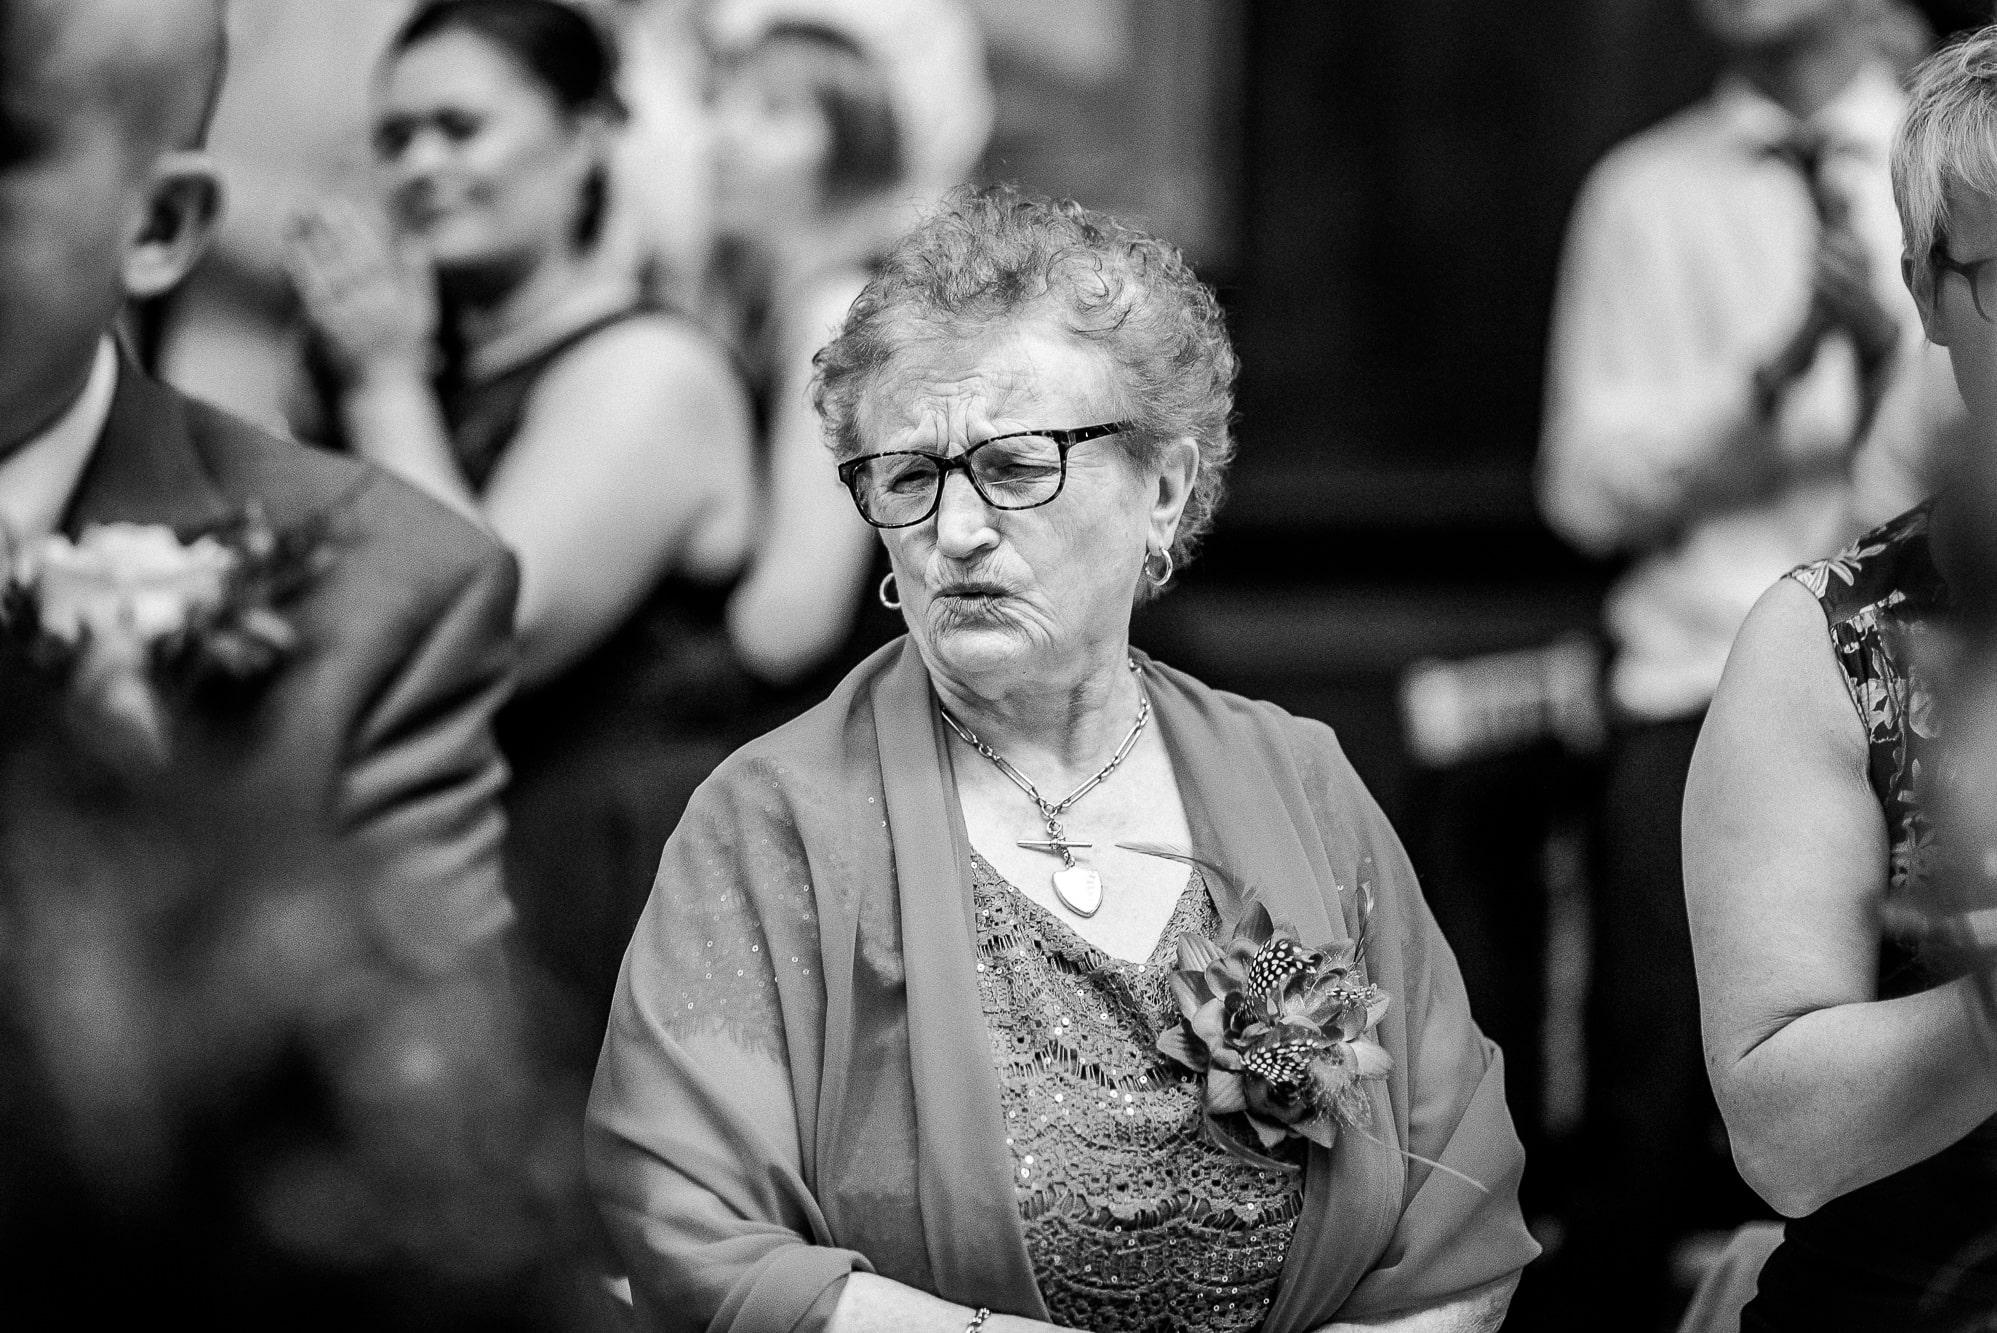 Nan pulling a face